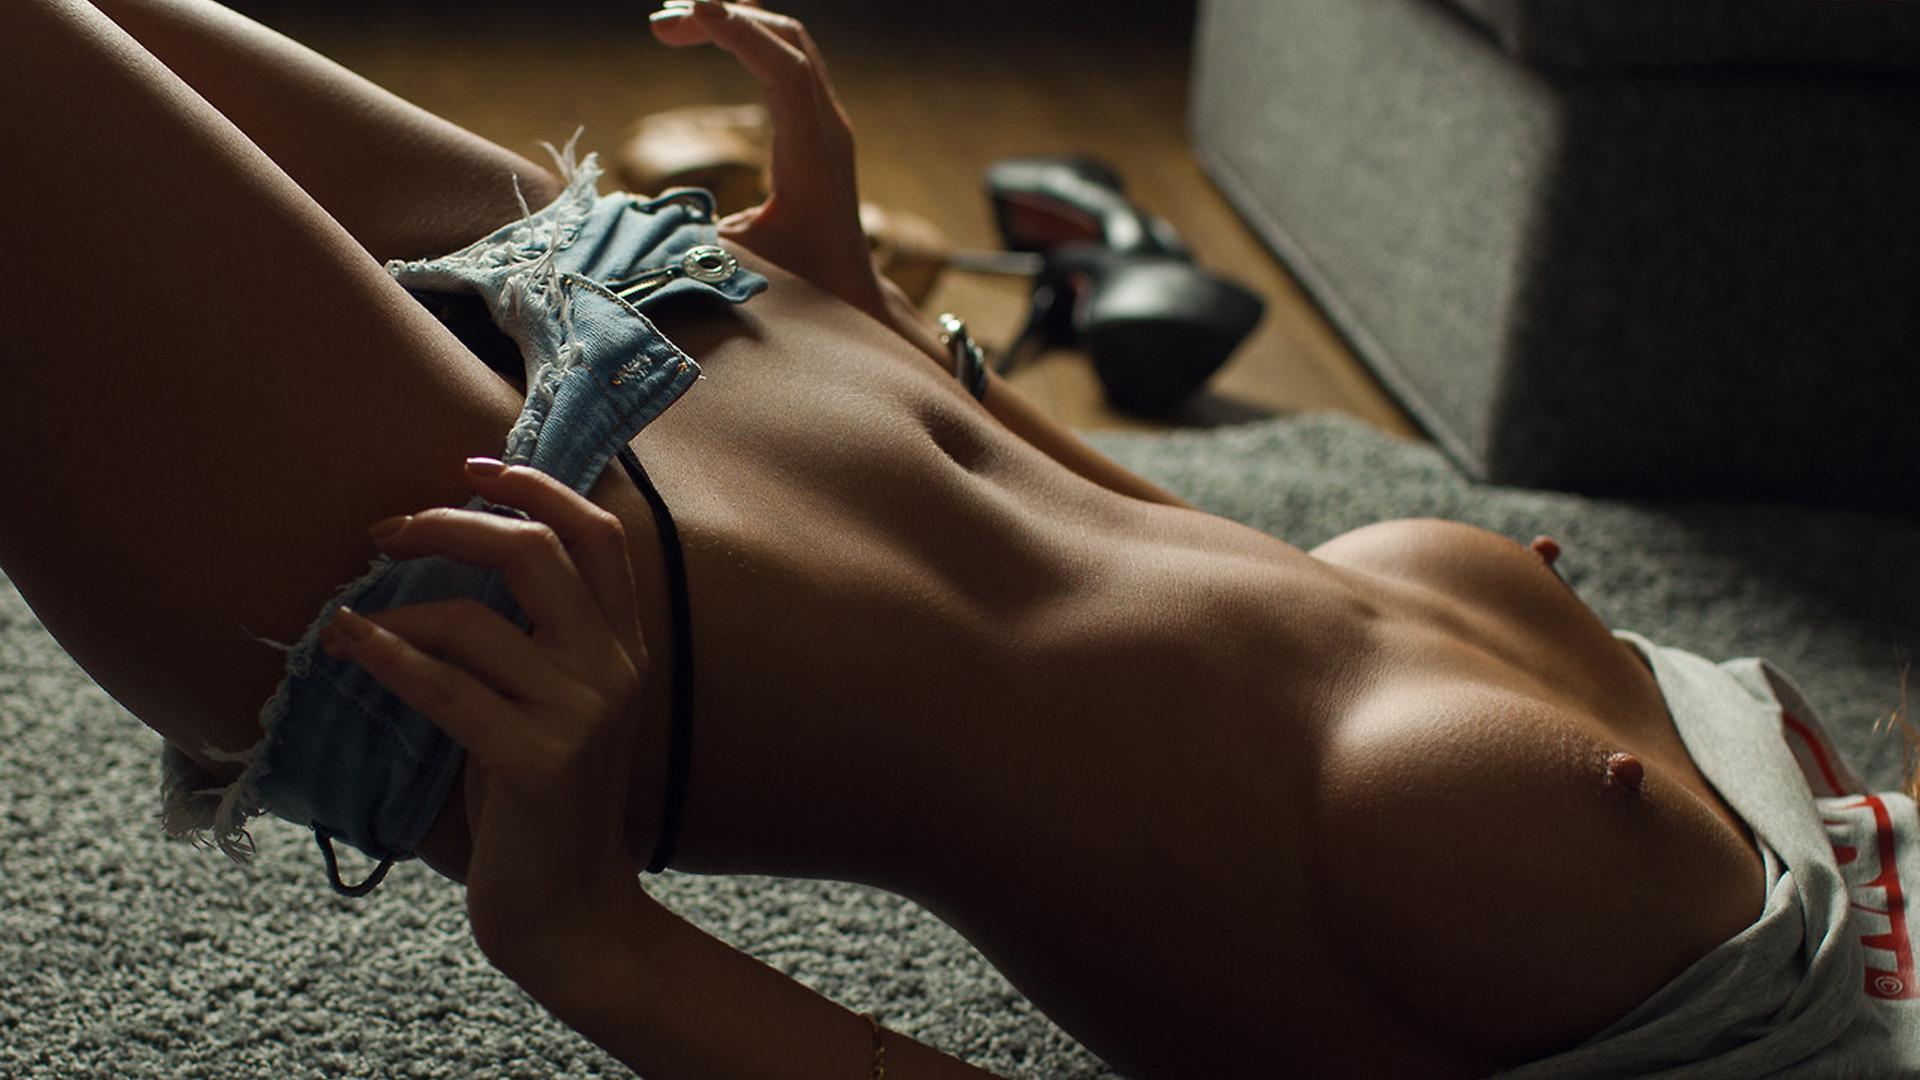 erotichnie-foto-seks